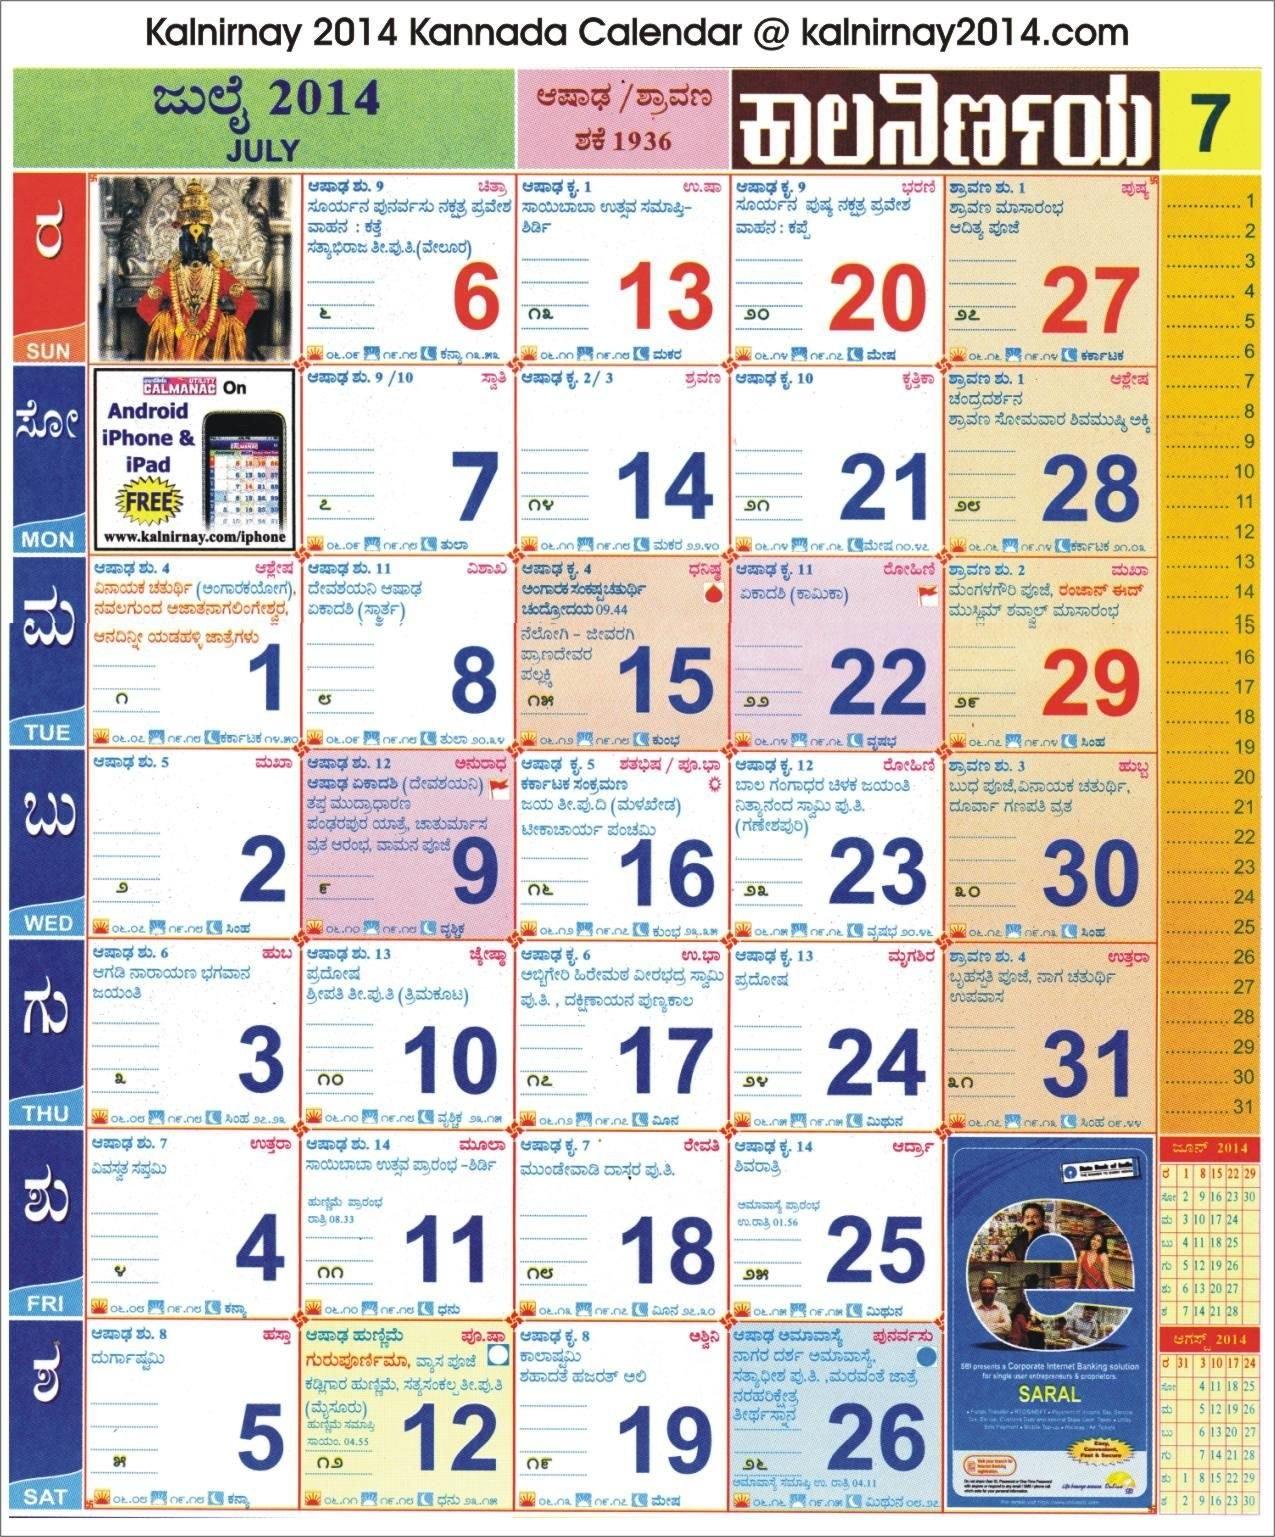 July 2014 Kannada Kalnirnay Calendar | 2014 Kannada Kalnirnay P C Shabadimath Kannada Calendar 2019